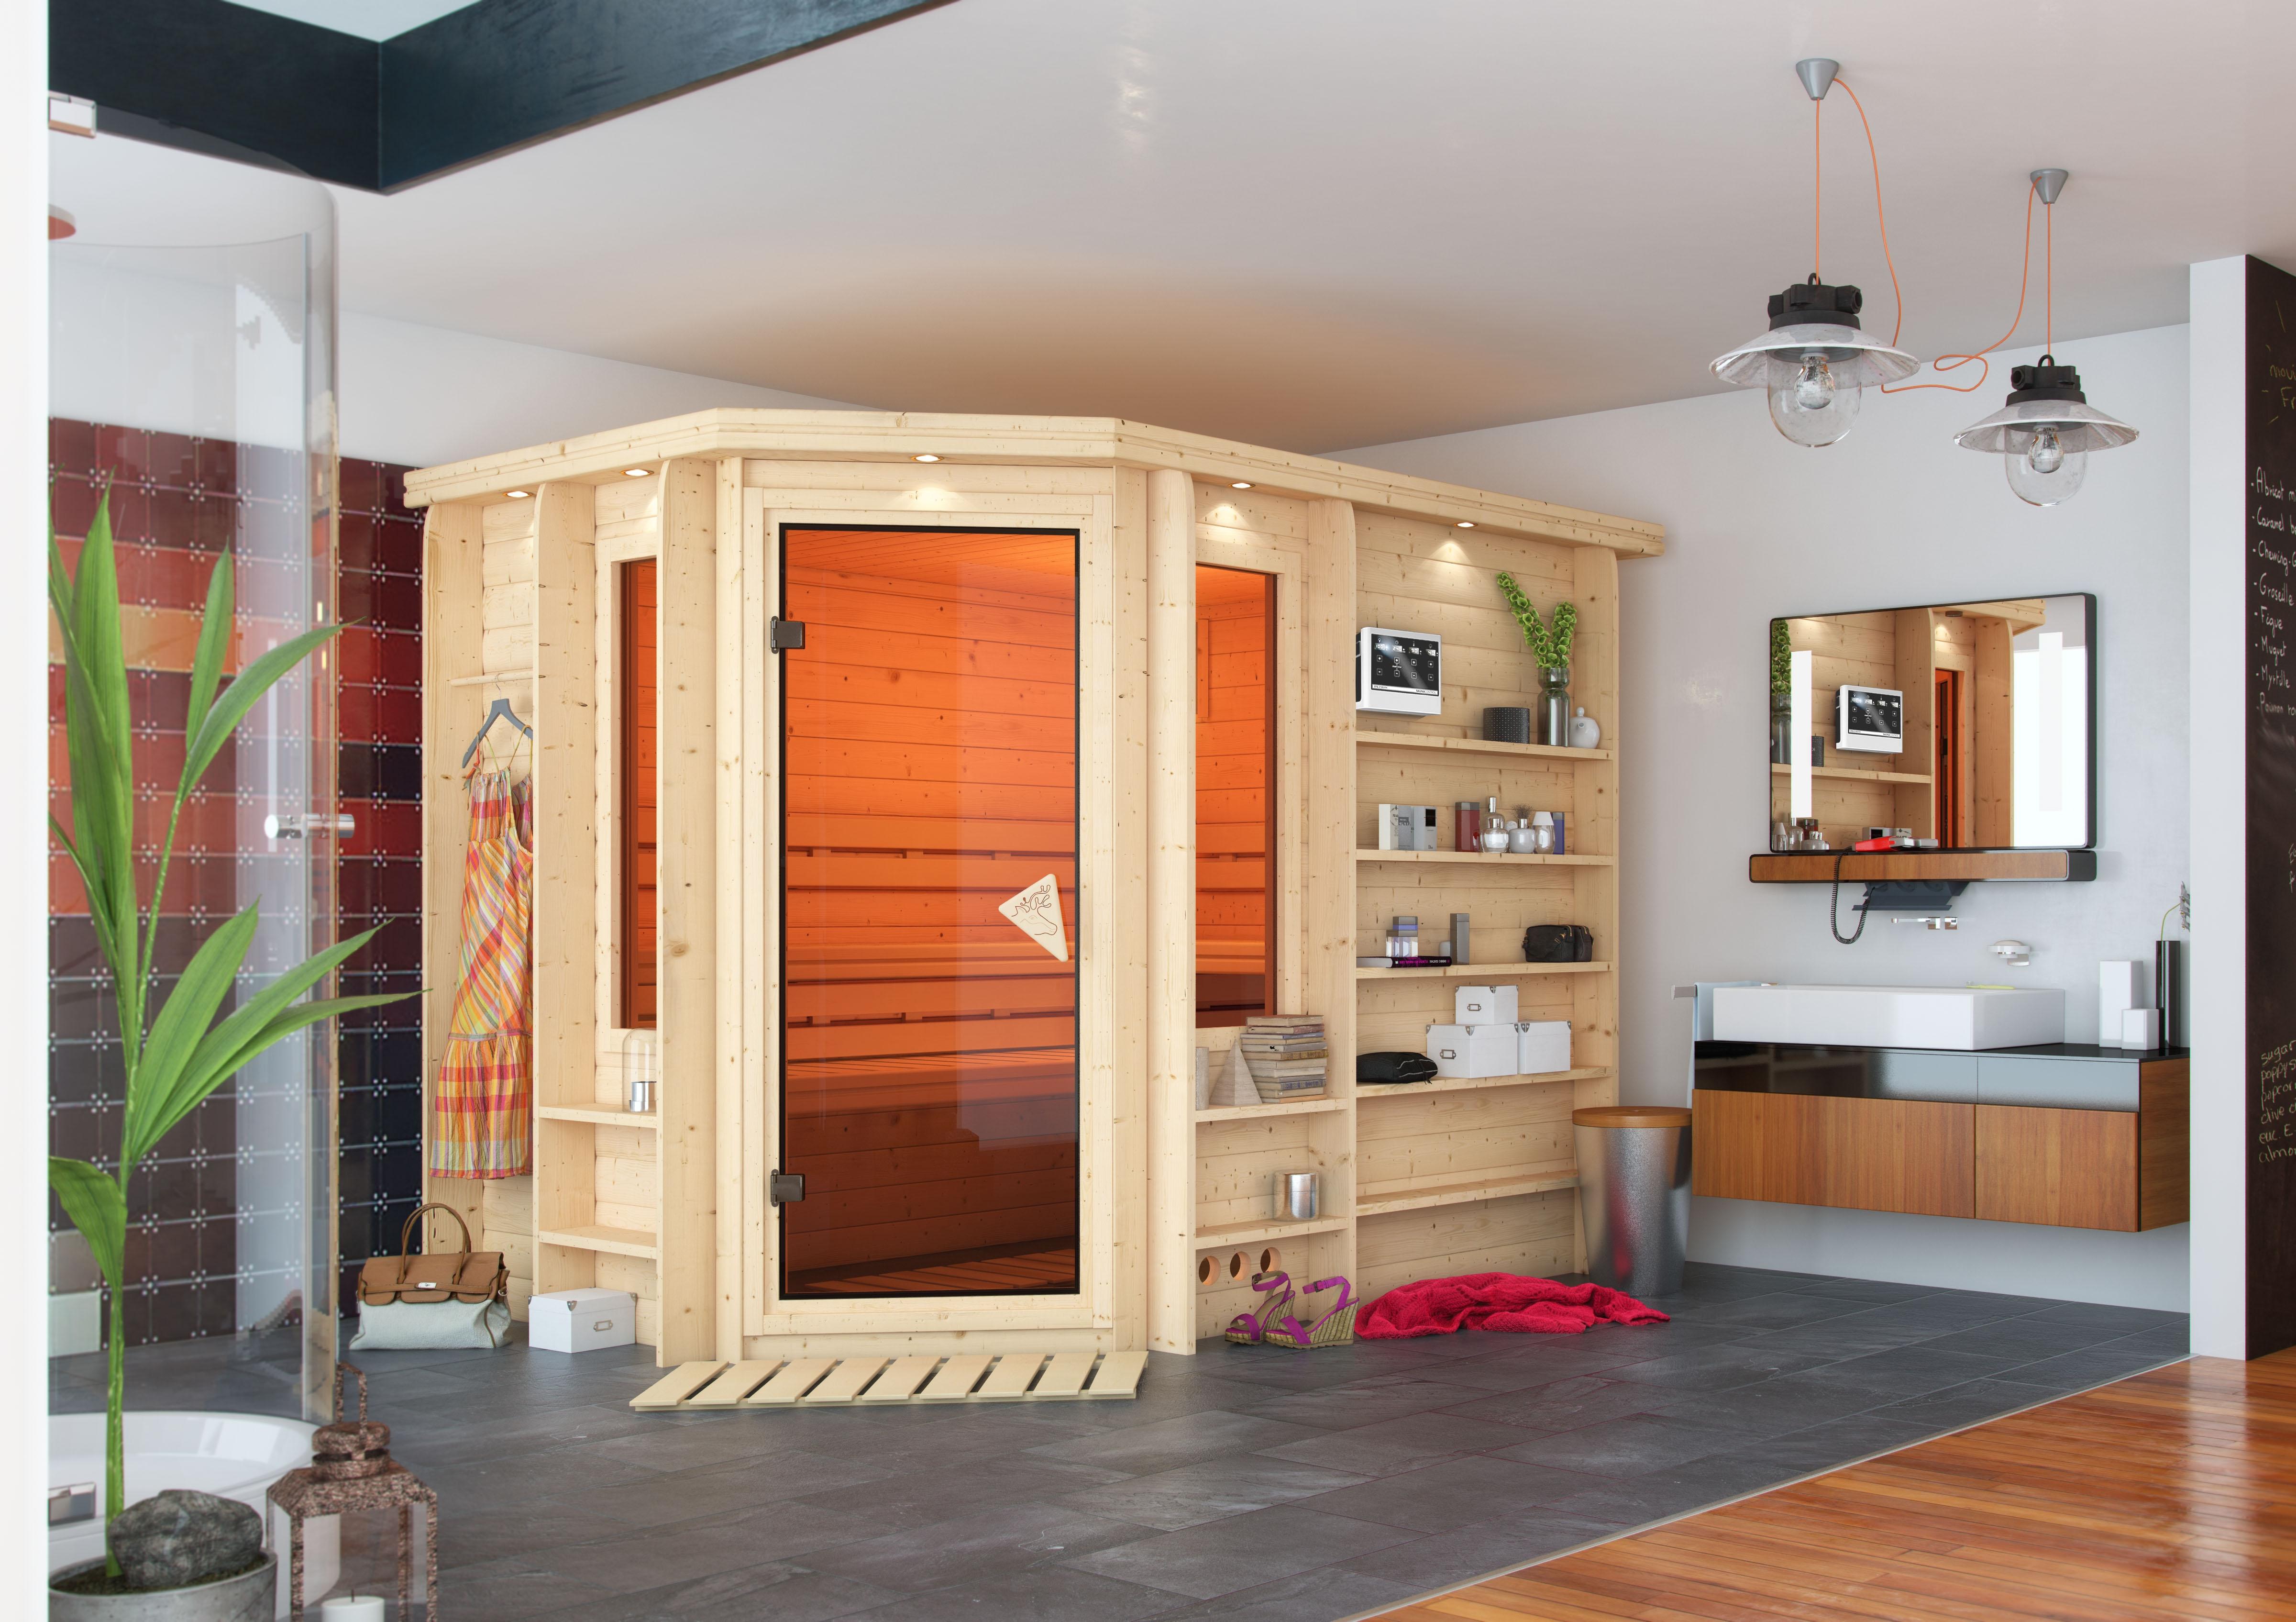 sauna heimsauna massivholz eckeinstieg 262 x 253 x 212 cm saunakabine karibu ebay. Black Bedroom Furniture Sets. Home Design Ideas